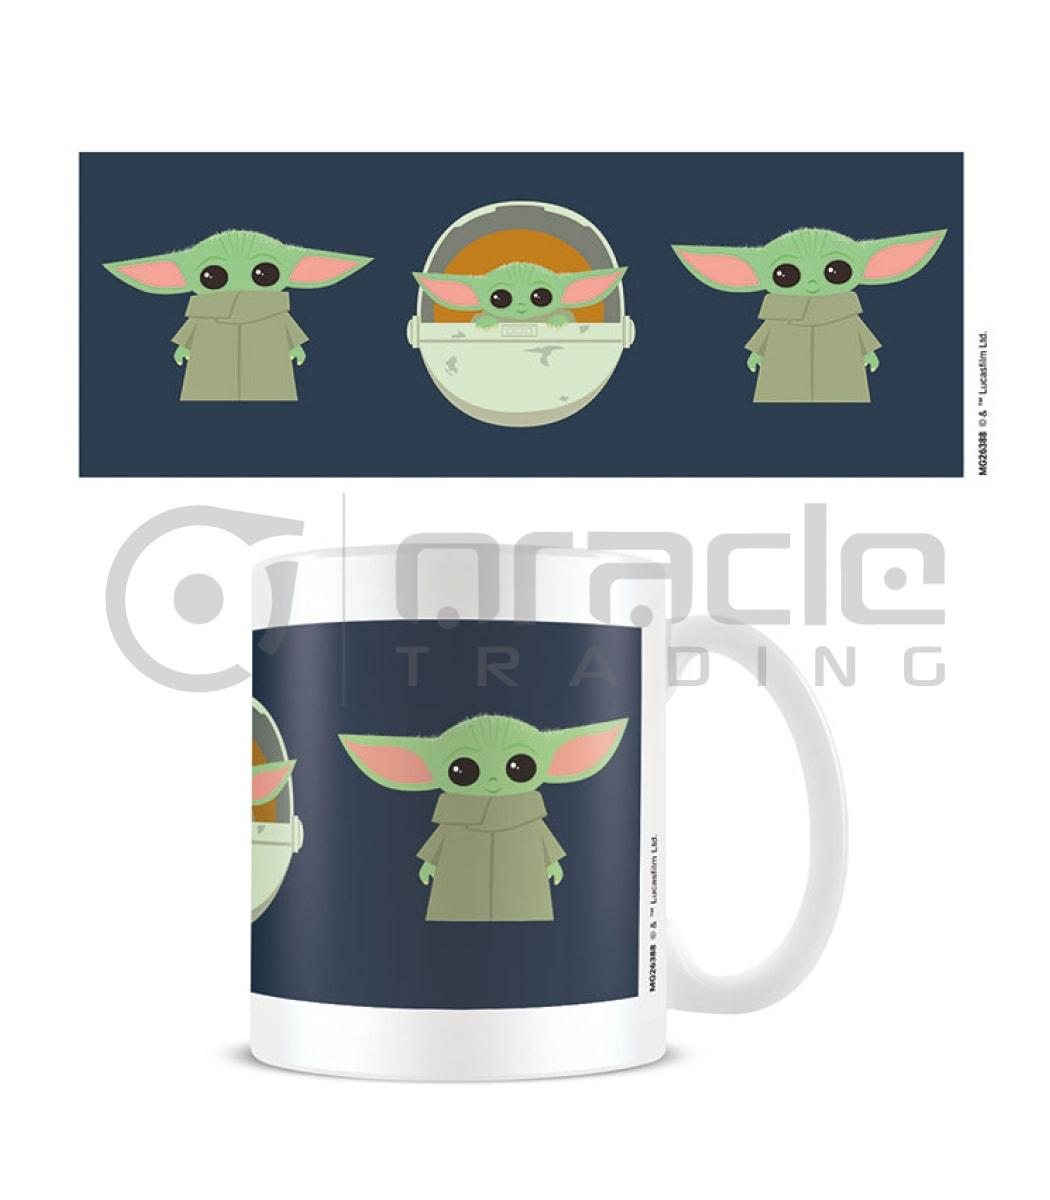 Star Wars: The Mandalorian Mug - Illustration